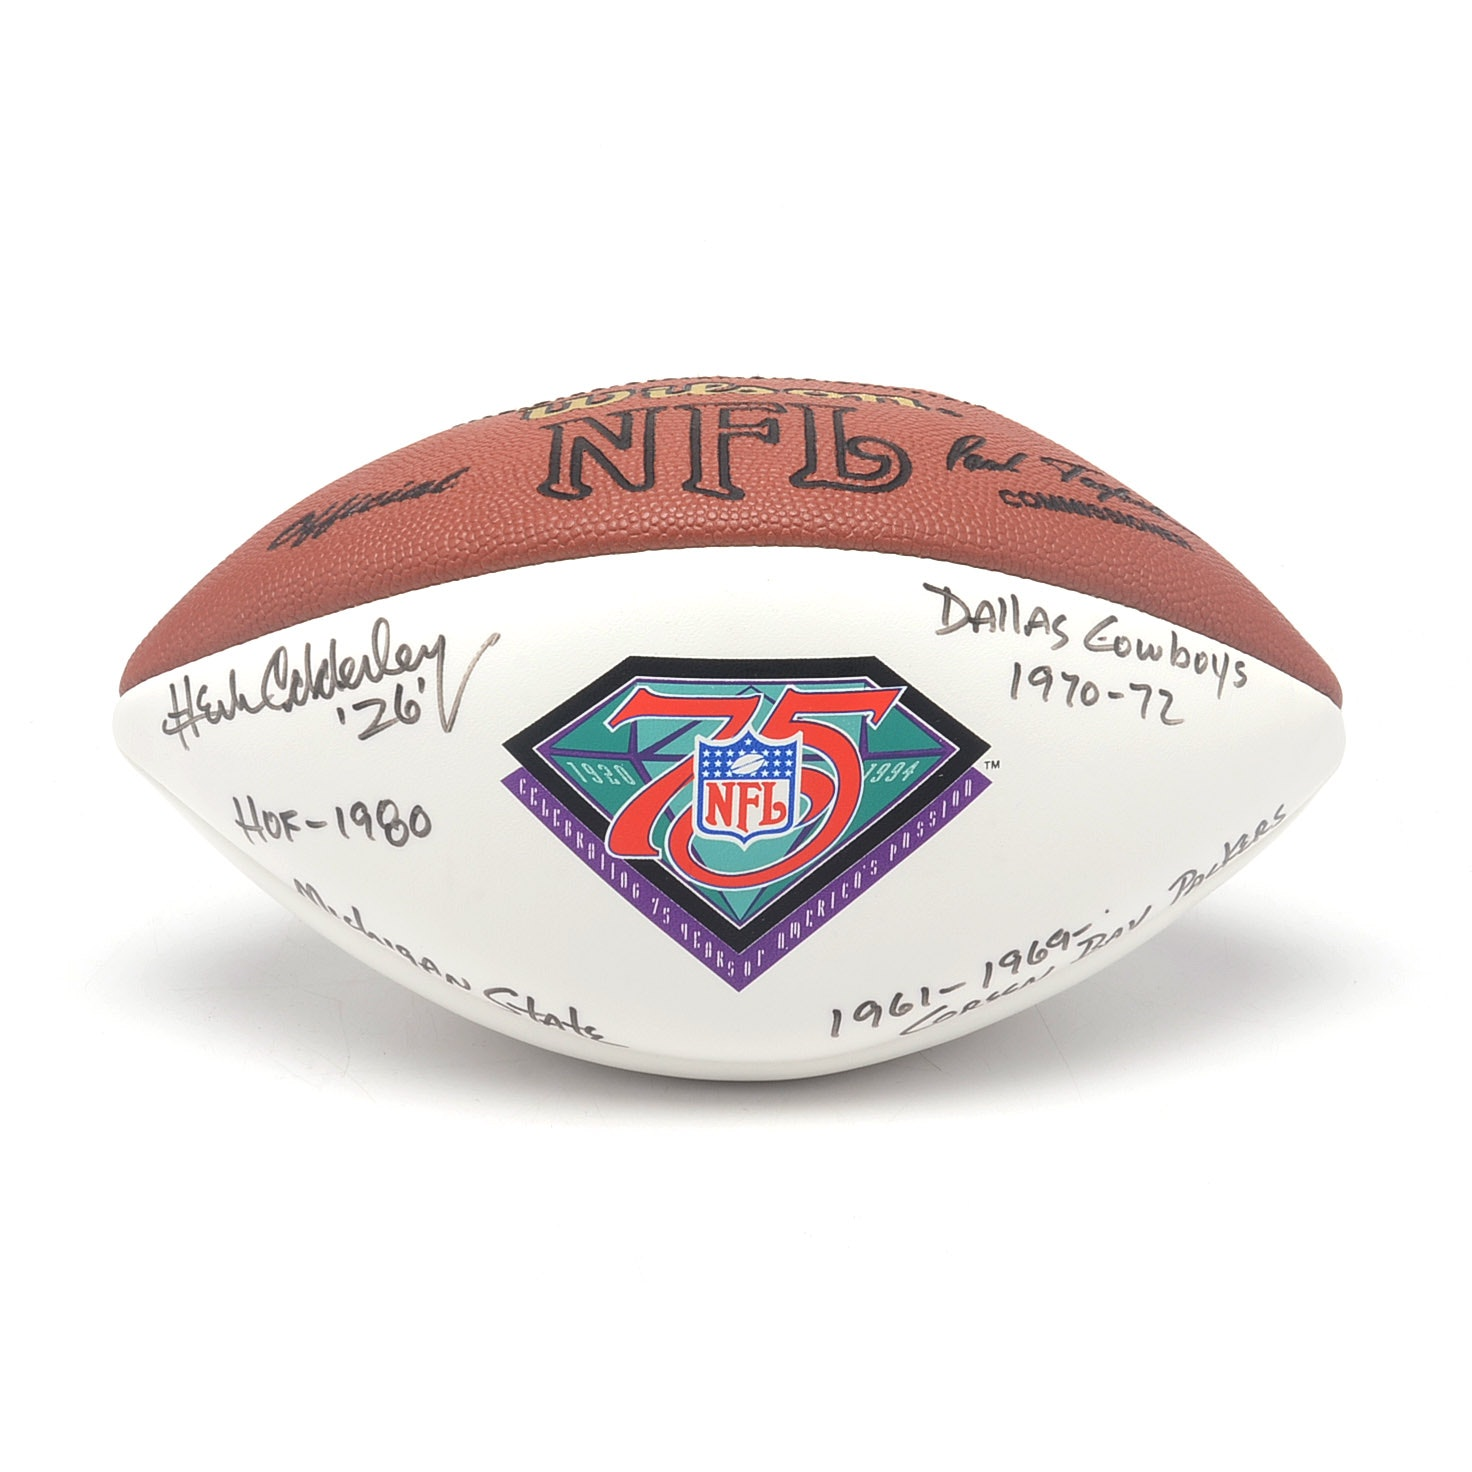 Herb Adderley Autographed Football  COA